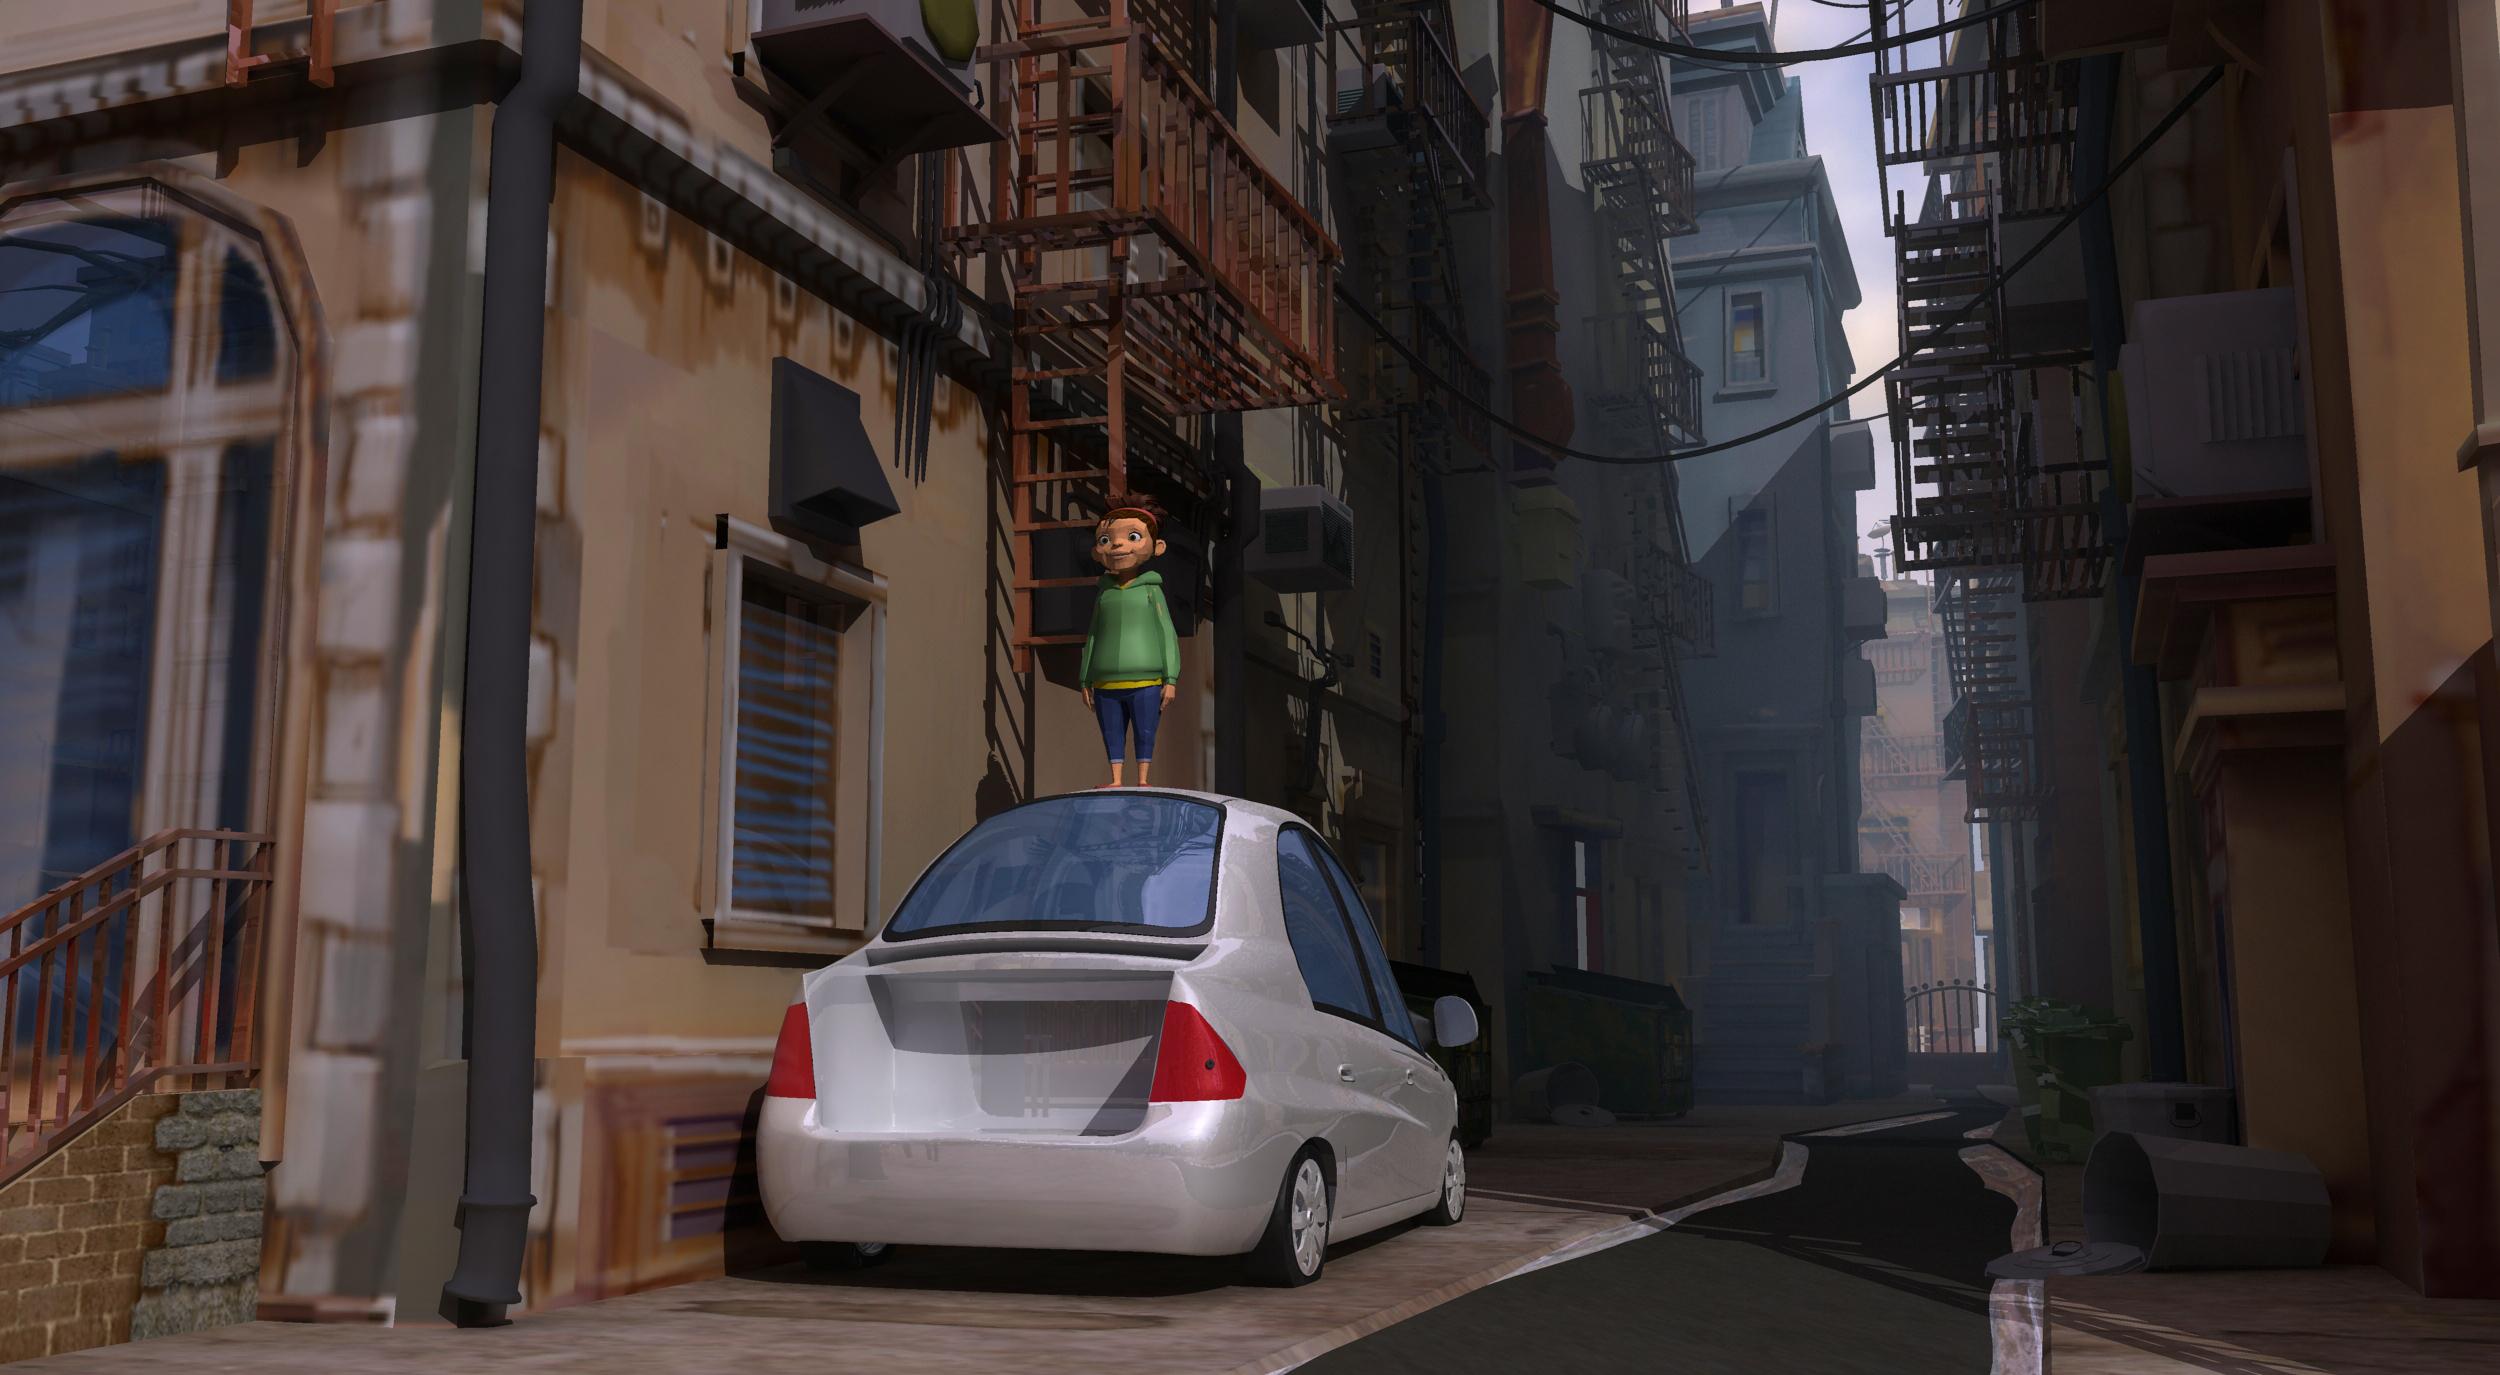 boston_tips_apt_render_4.jpeg